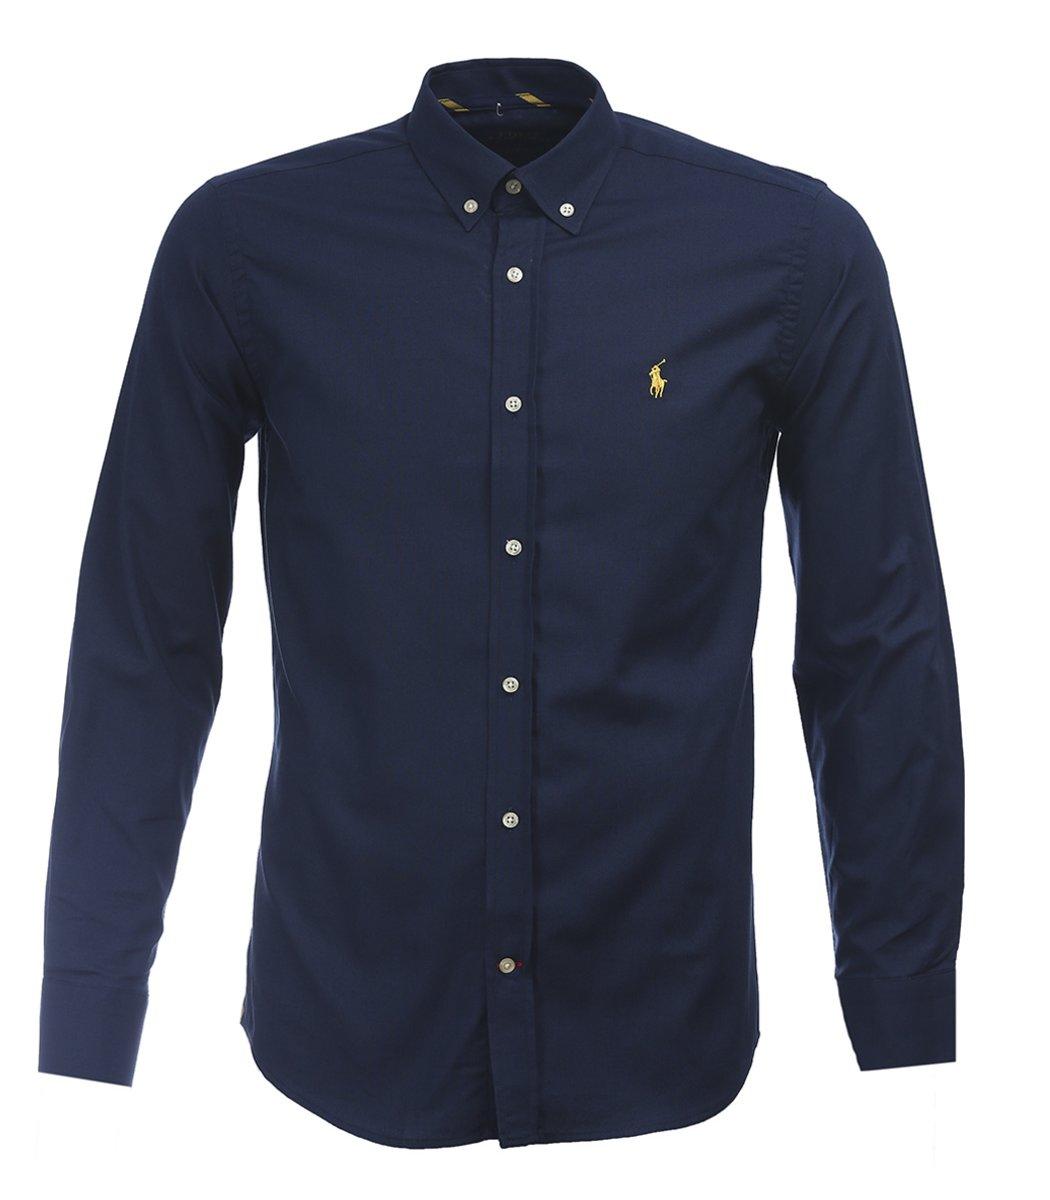 Темно-синяя рубашка POLO Ralph Lauren classic